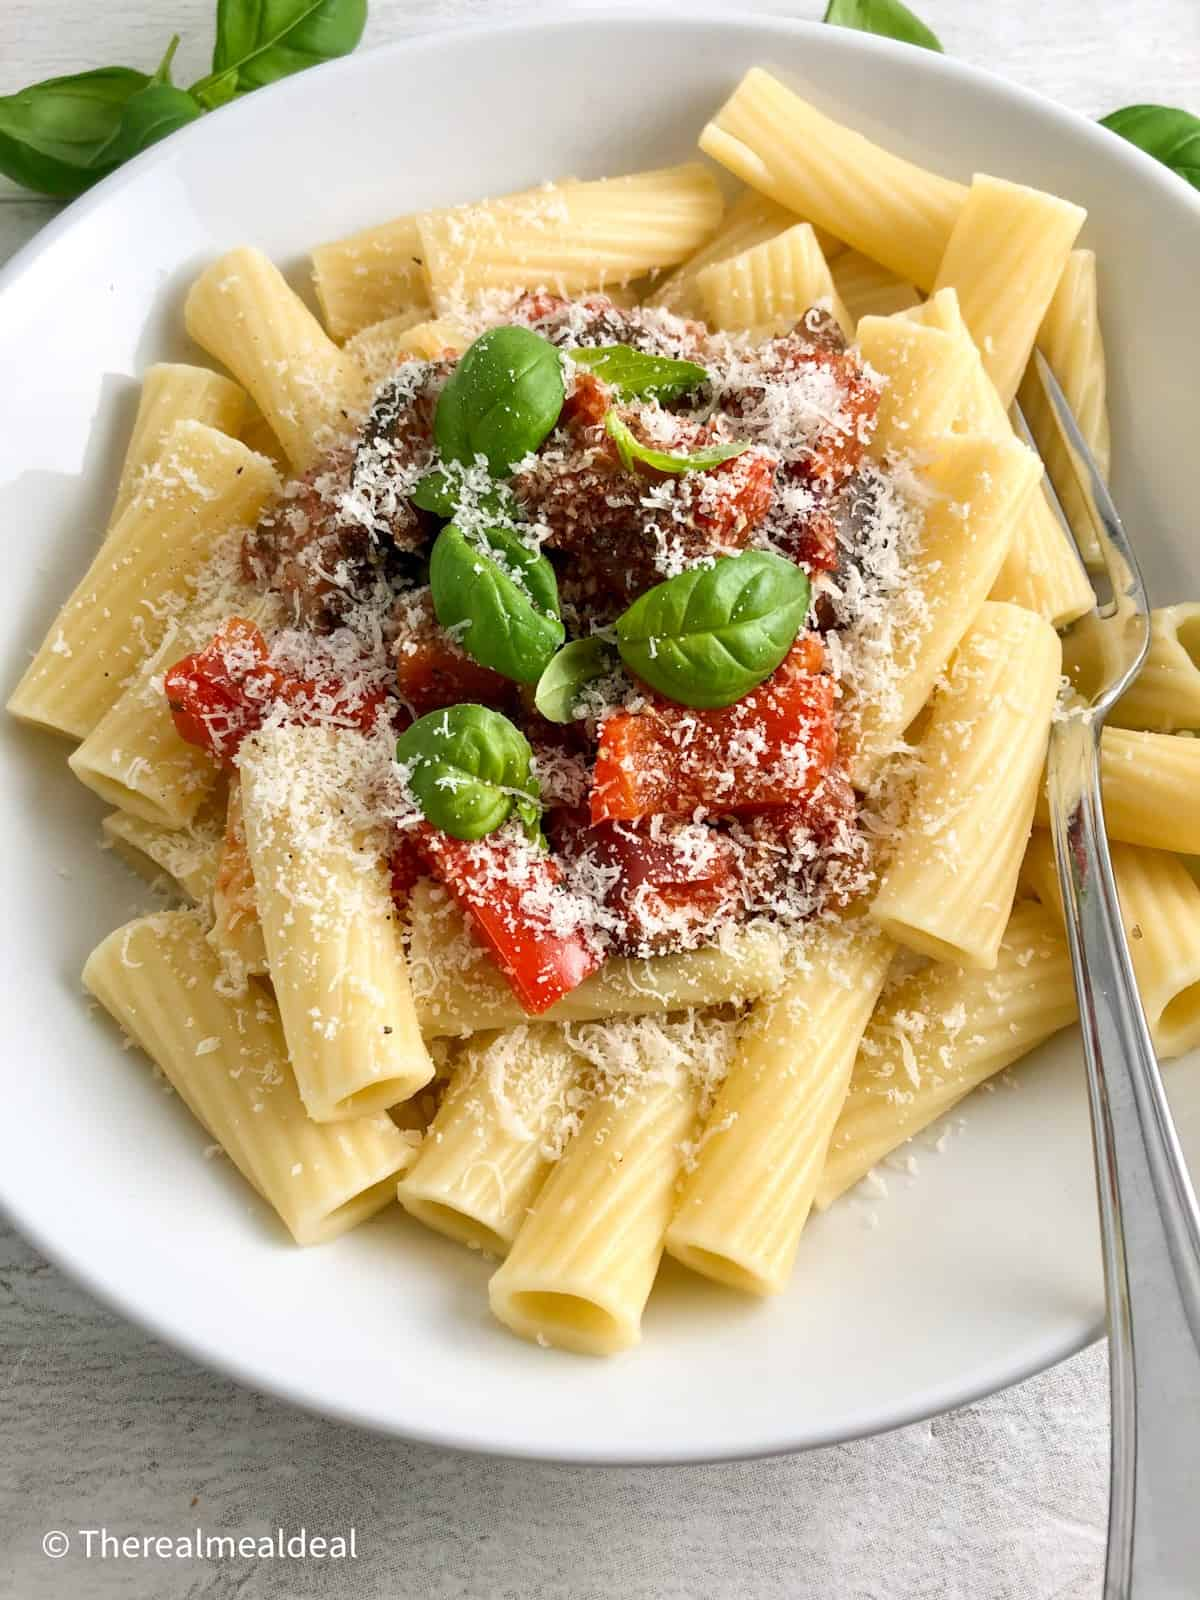 tomato pasta sauce served wth rigatoni and parmesan cheese